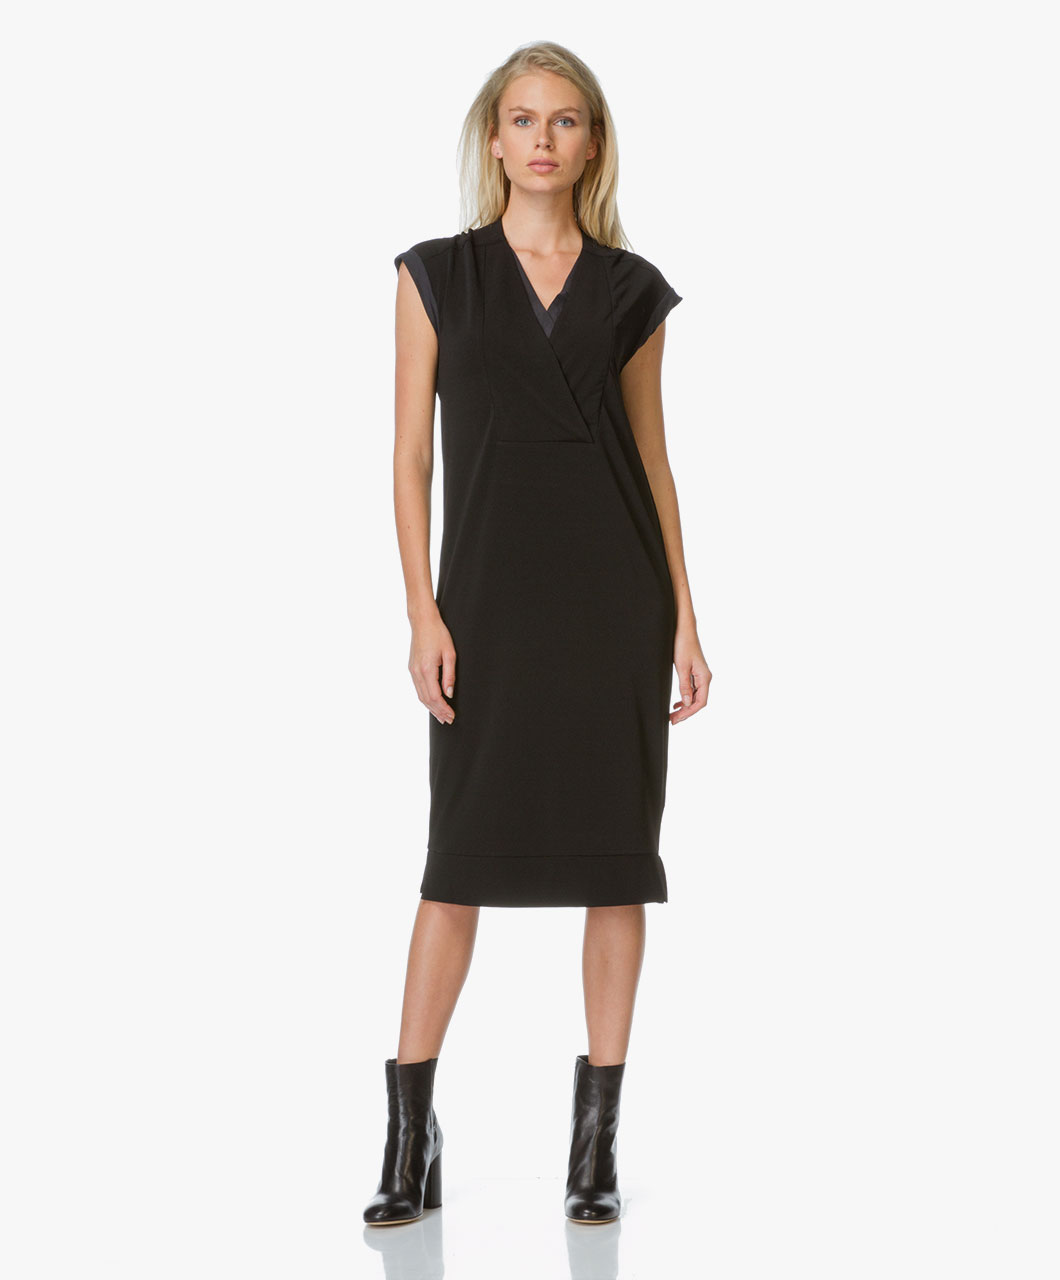 Malene Birger Axelremsväska : By malene birger harluna dress black